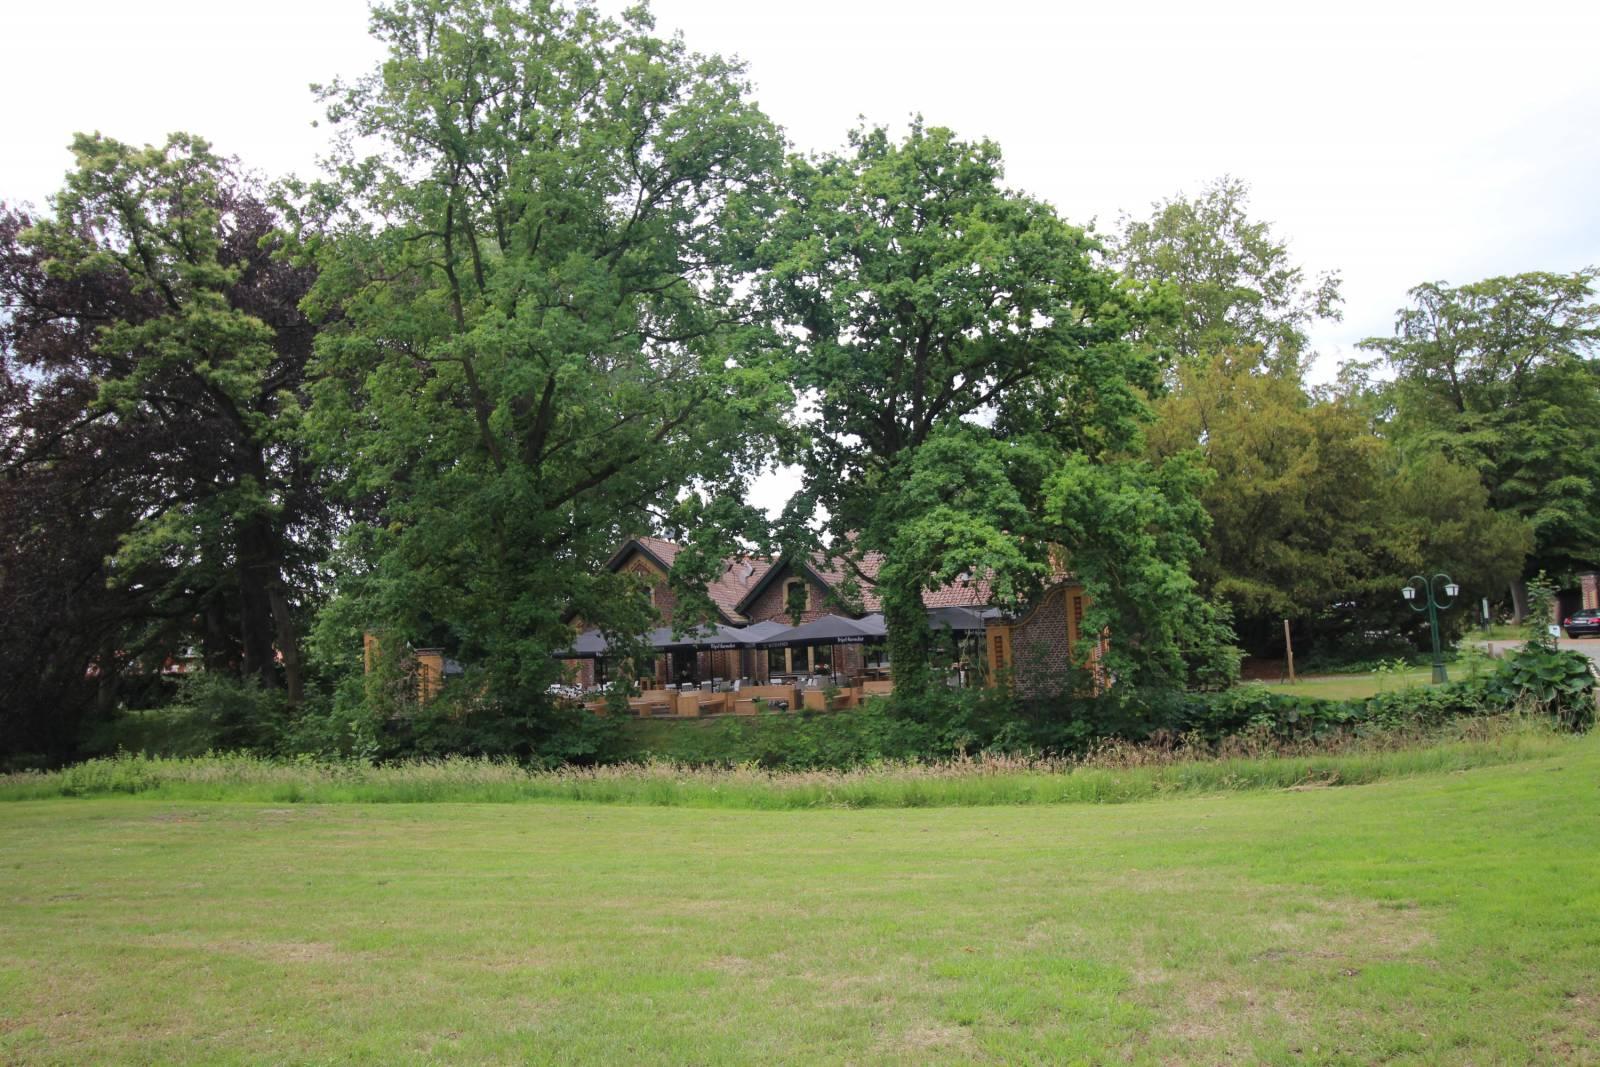 Kasteel D'artrycke - Feestzaal - House of Weddings (12)